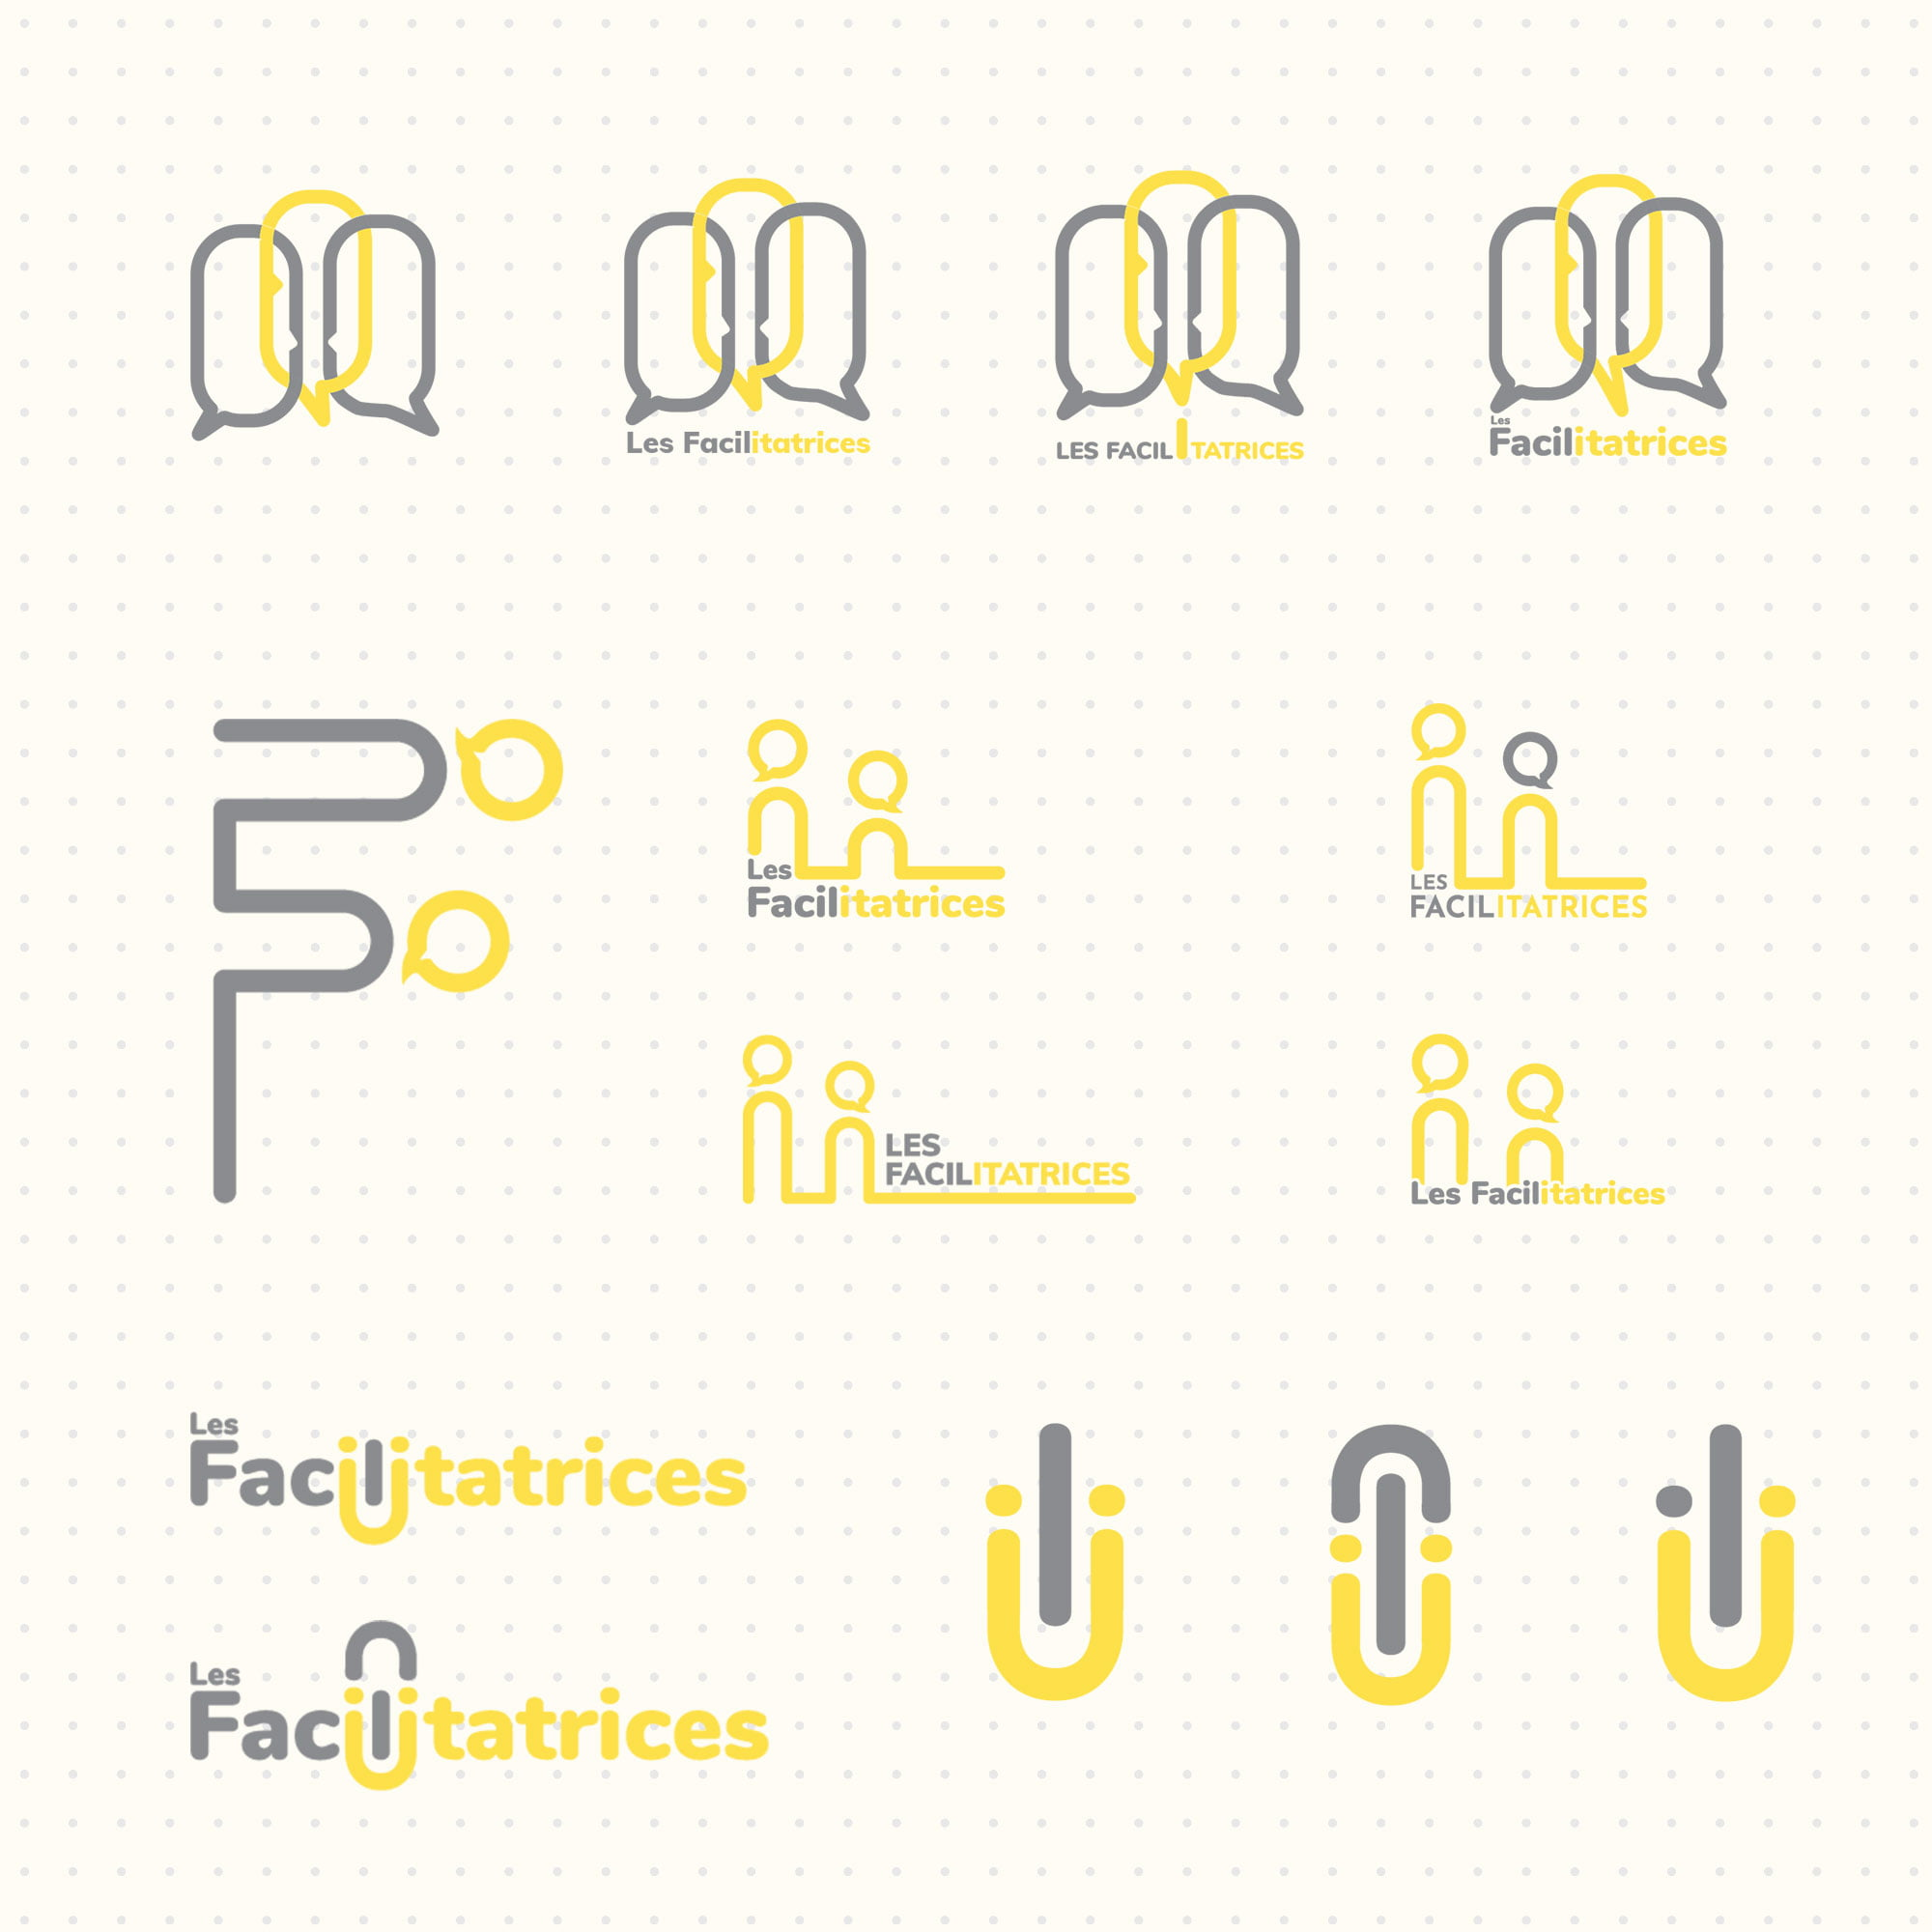 Les Facilitatrices logo recherche